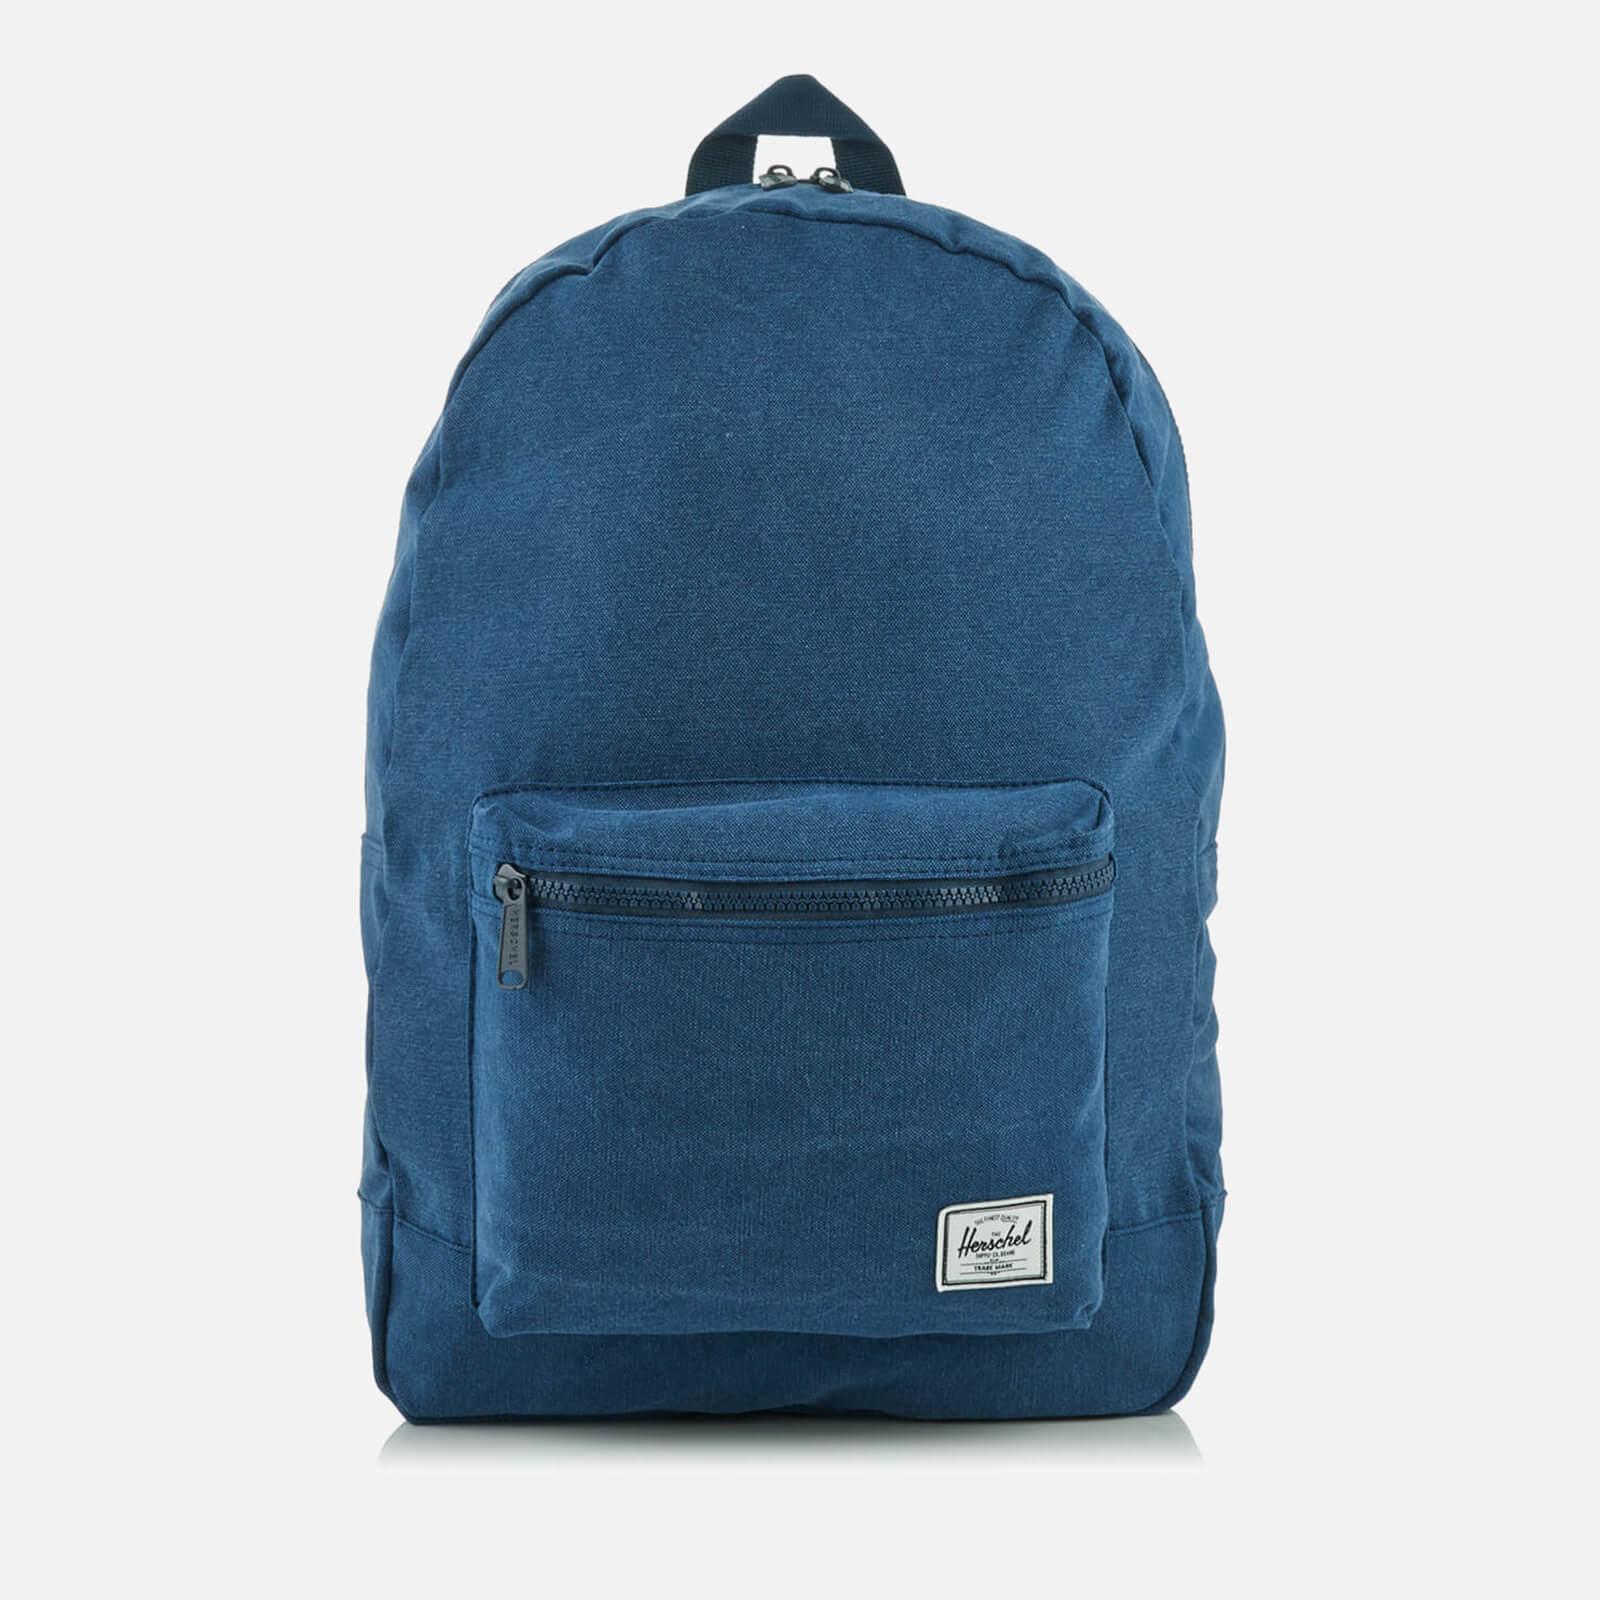 48a8eede480 Herschel Supply Co. Daypack Backpack - Navy - Free UK Delivery over £50